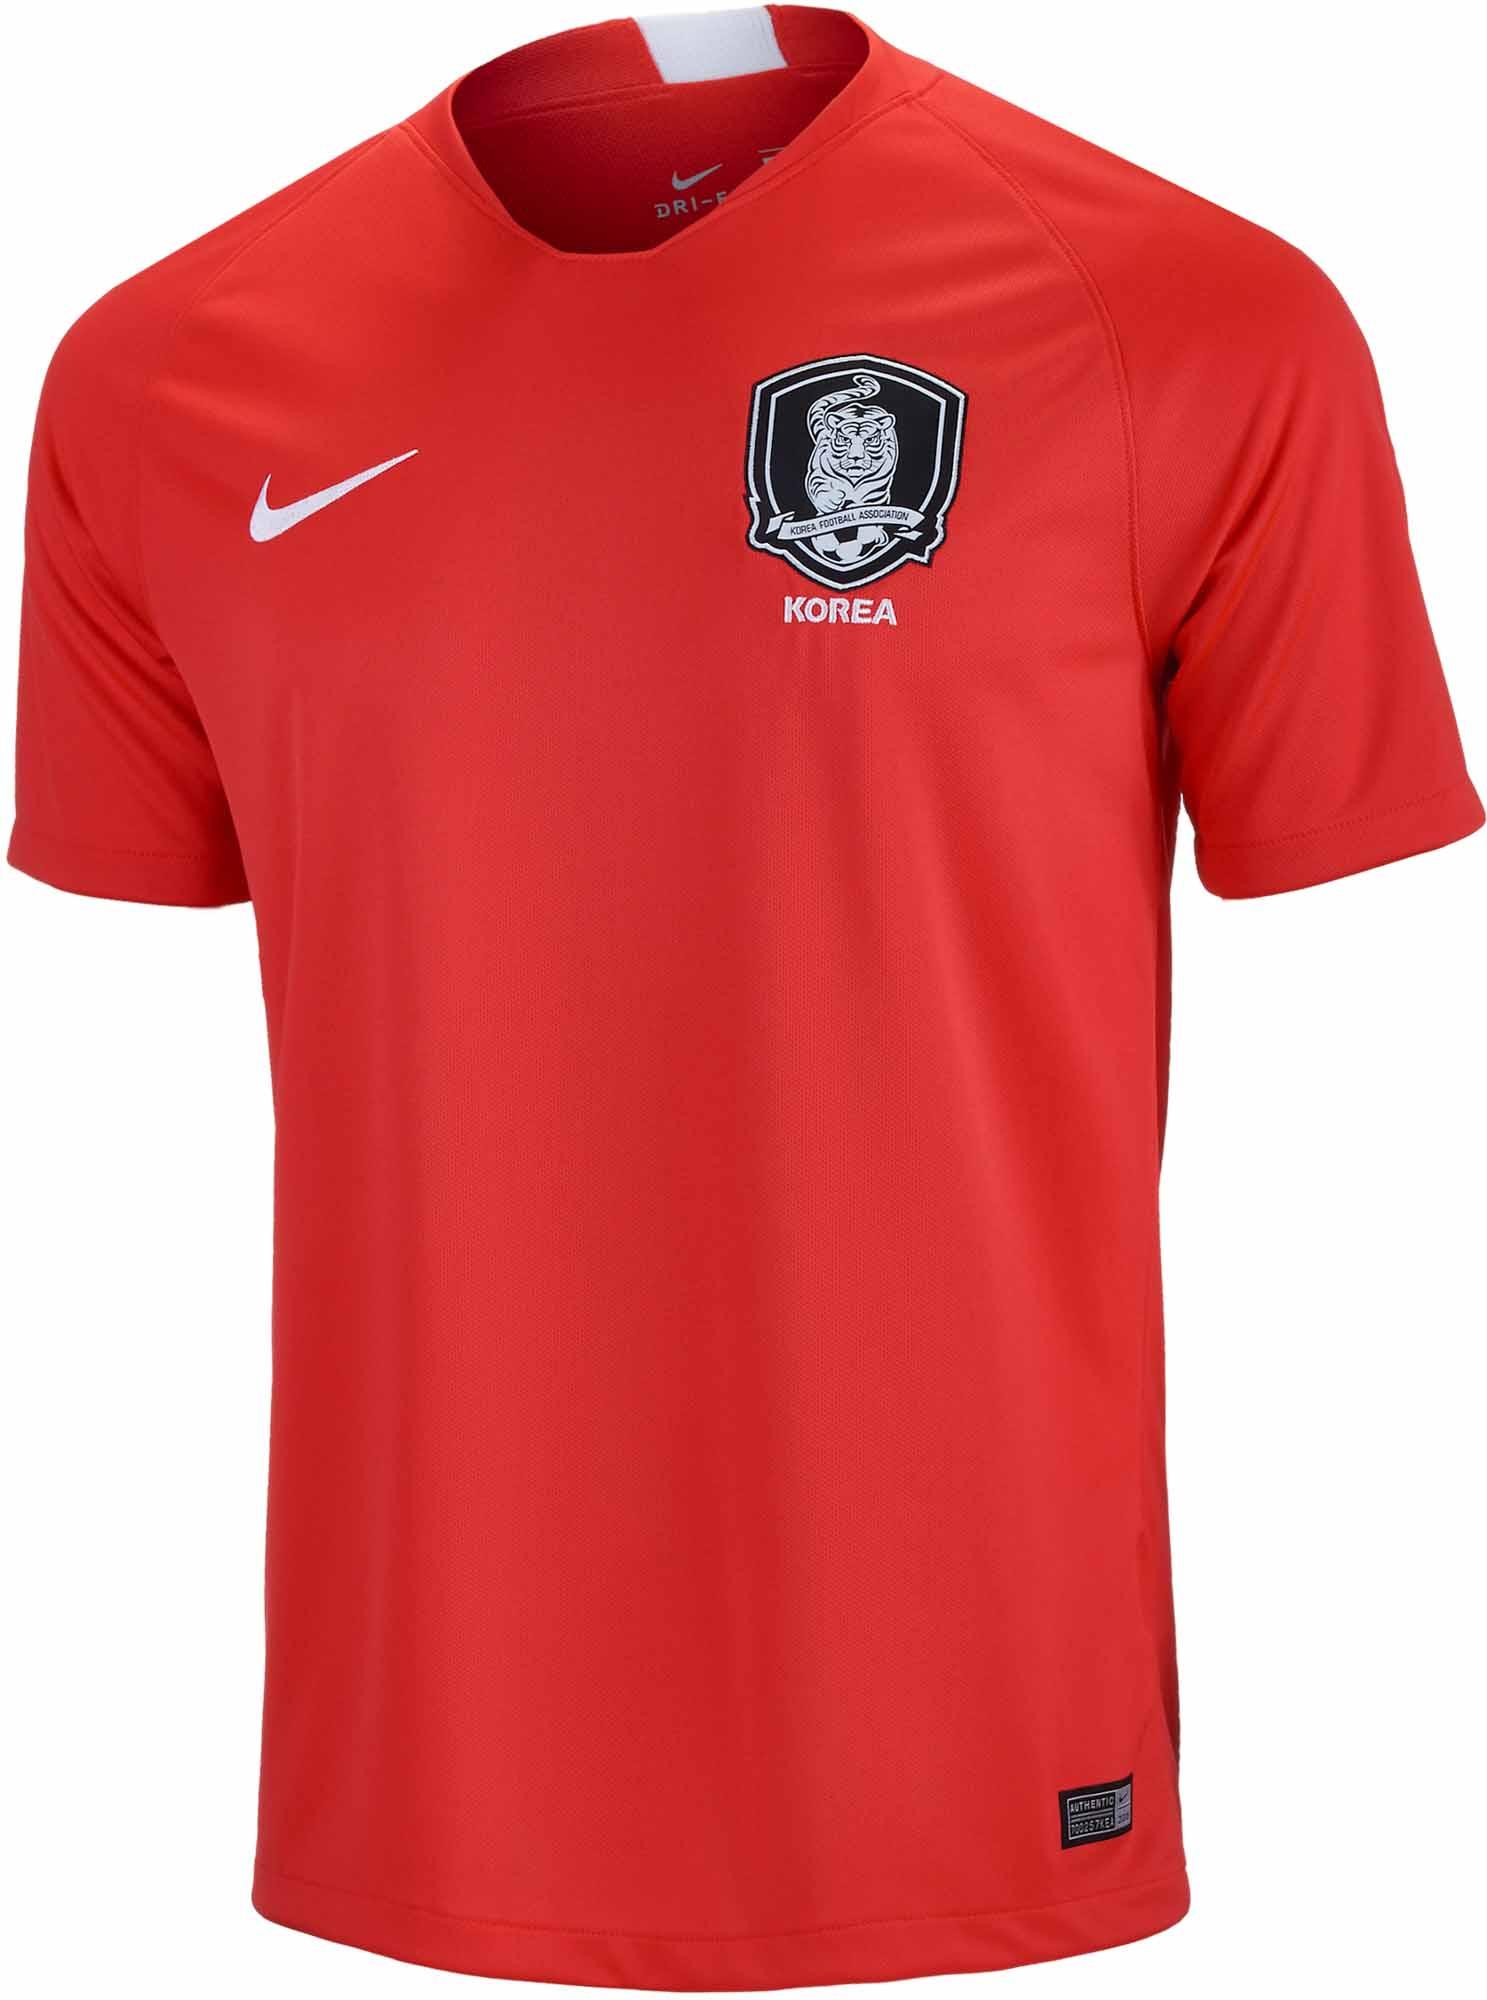 Nike South Korea Home Jersey 2018-19 - SoccerPro